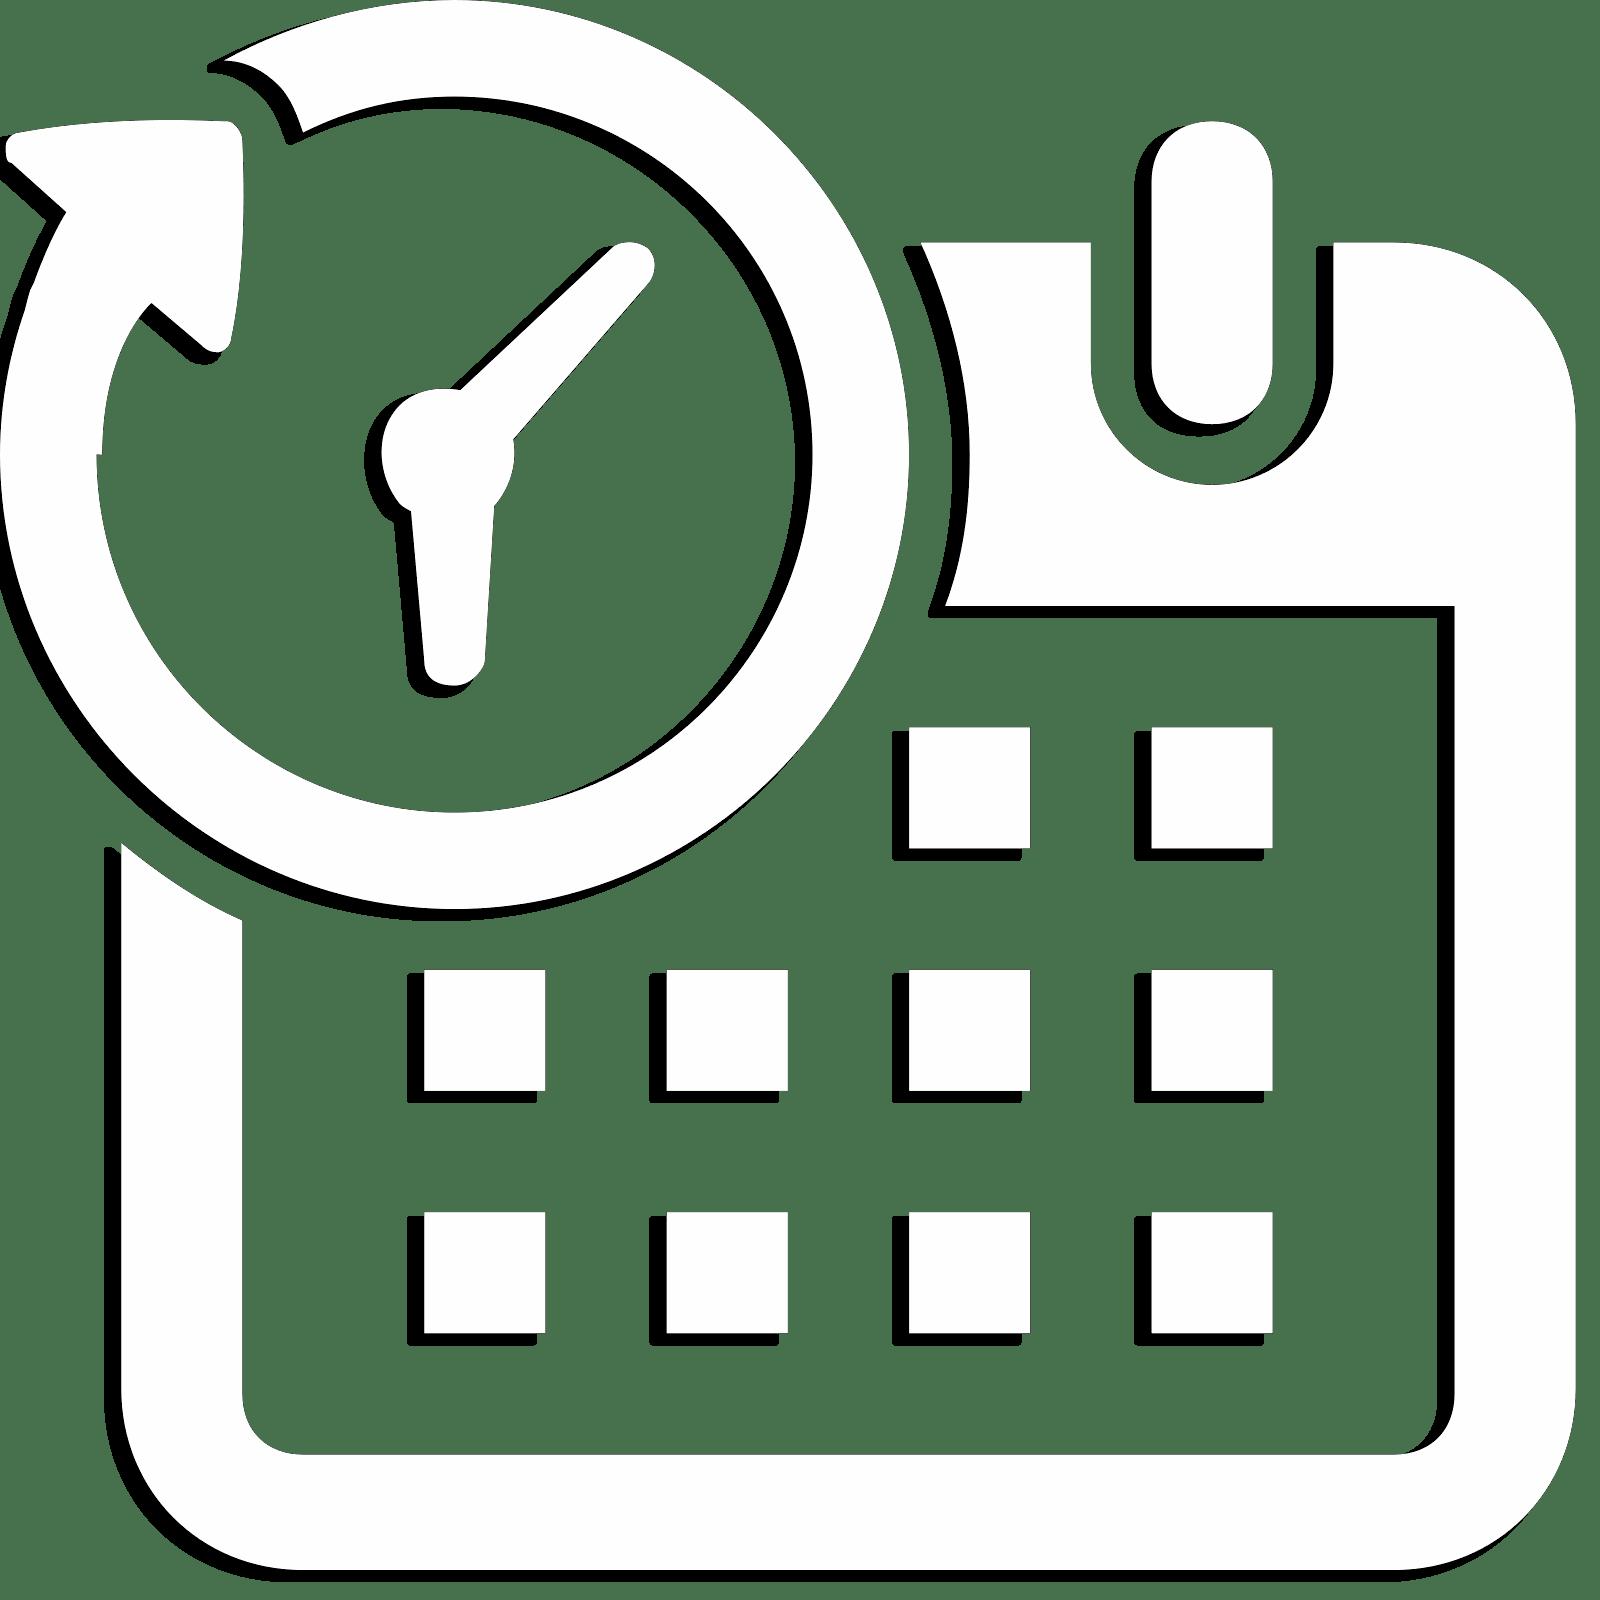 Planner clipart production plan. Demand forecasting replenishment planning